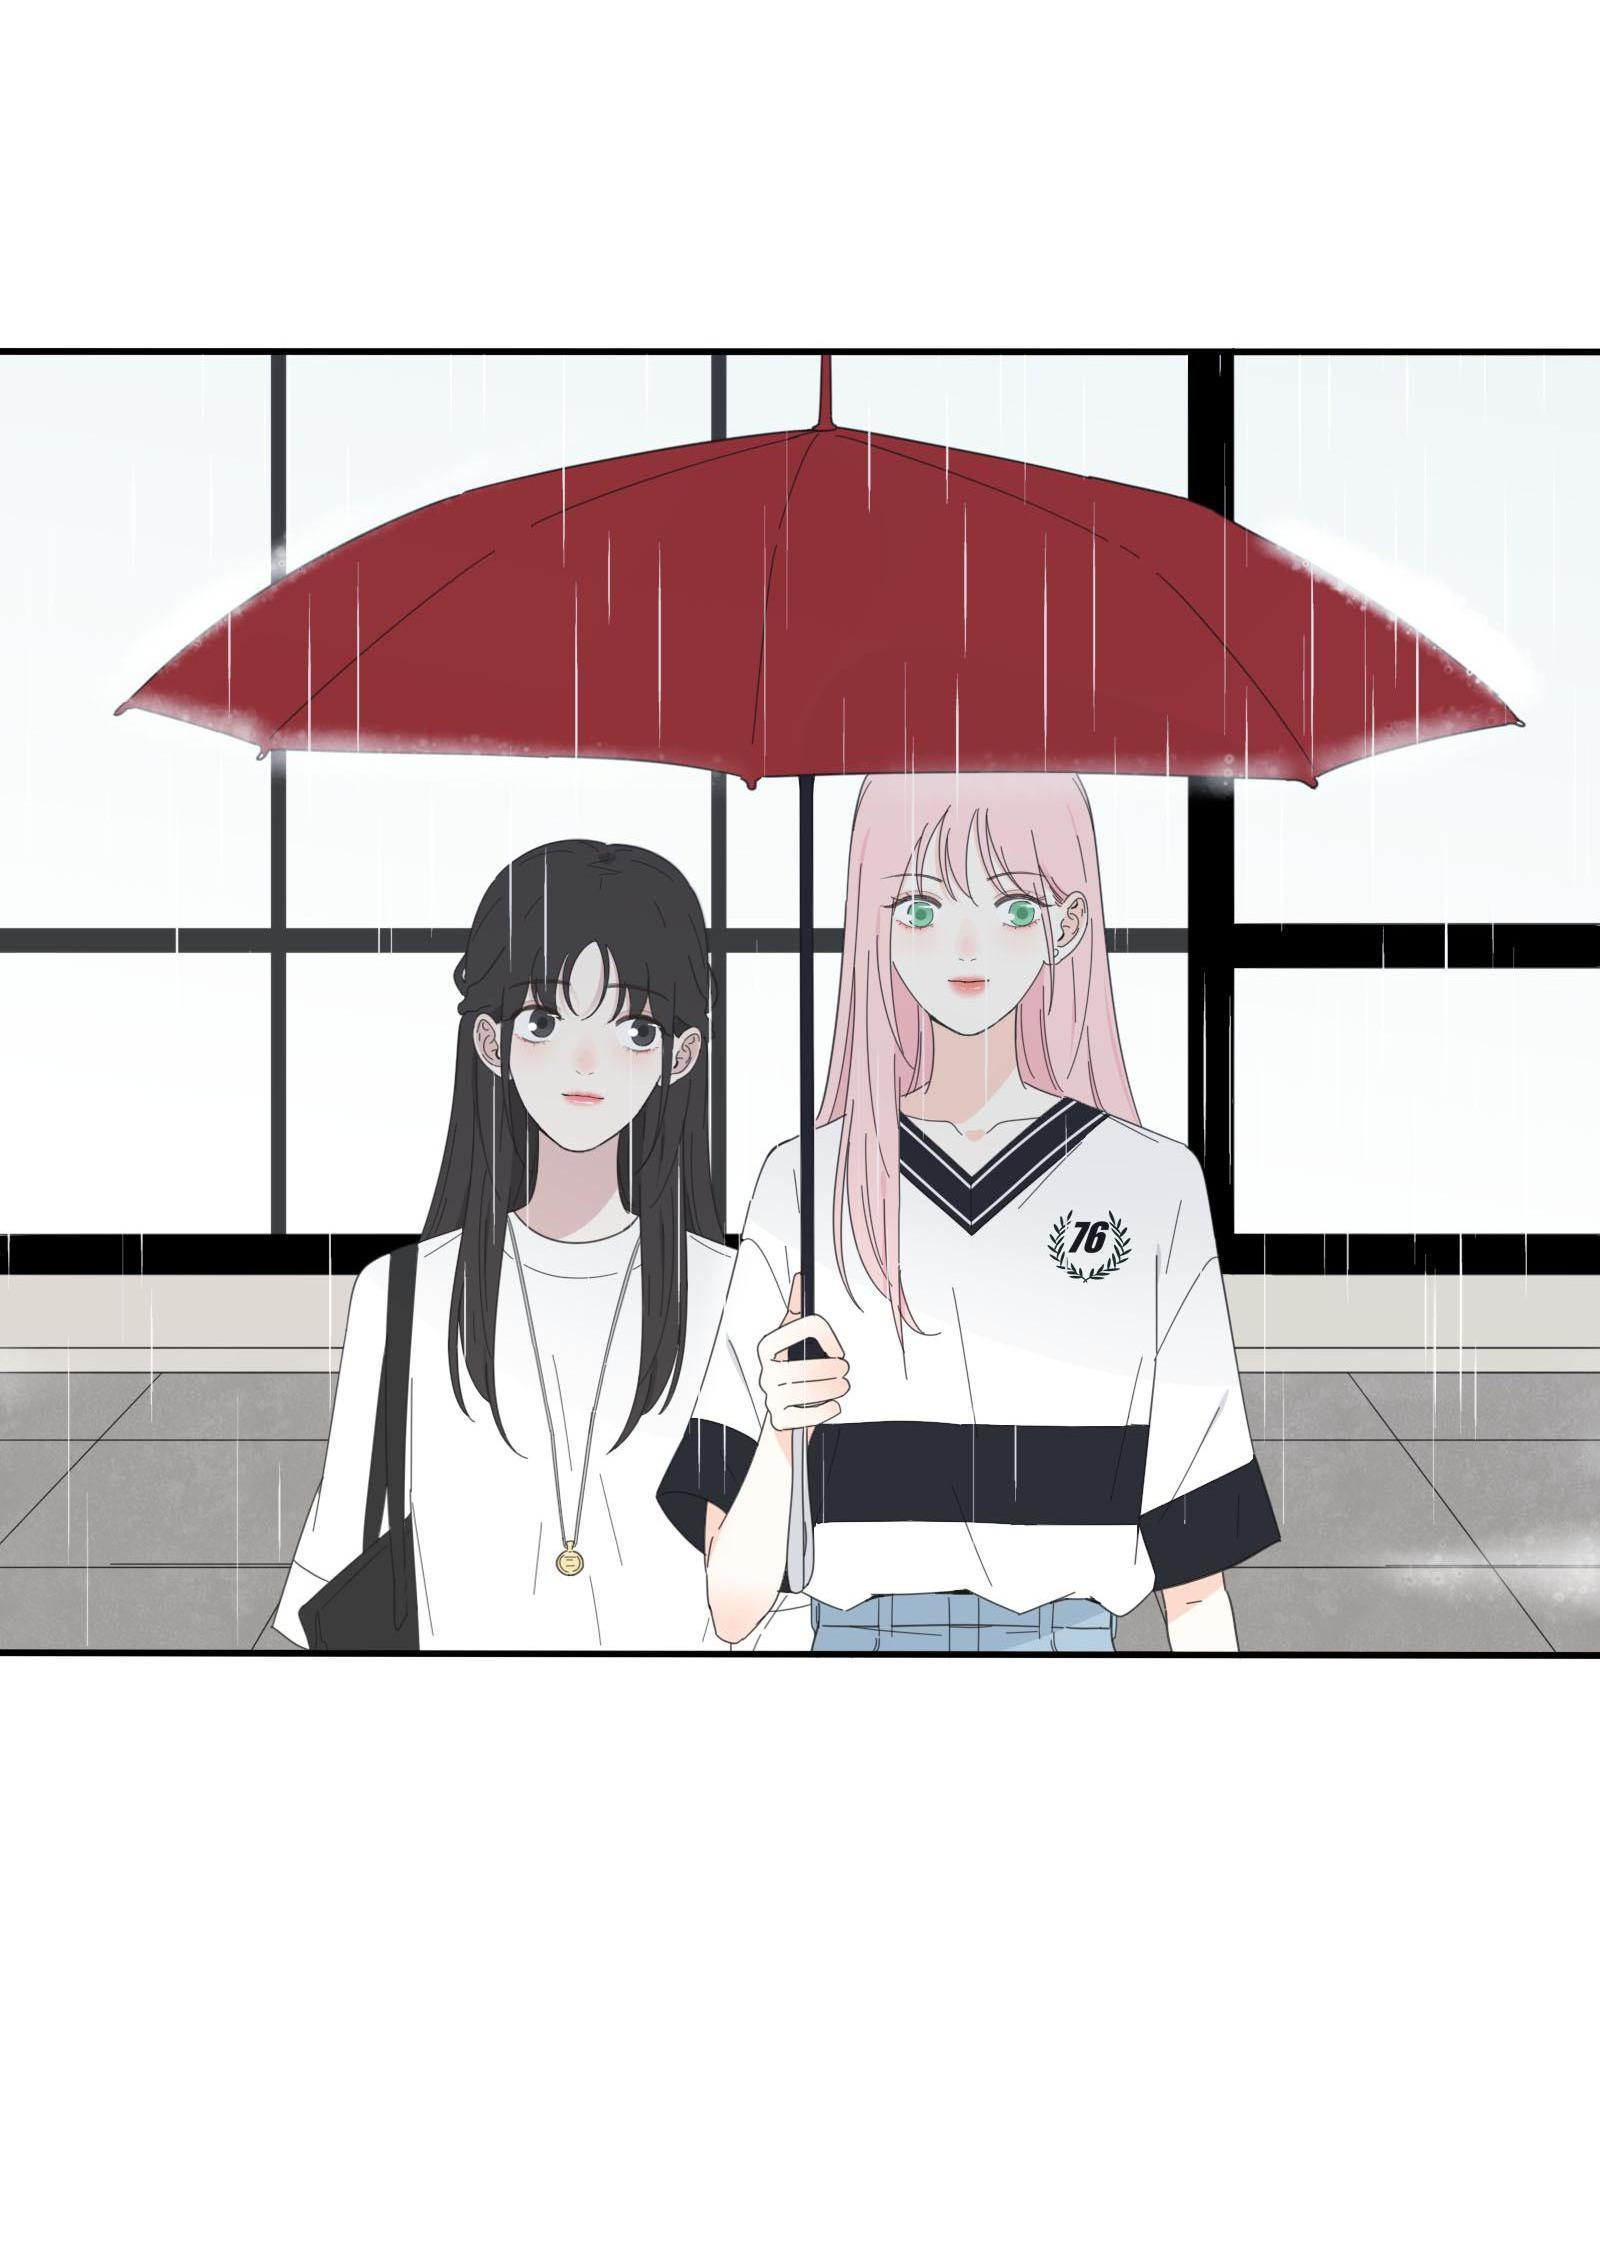 Baili Jin Among Mortals Chapter 33.5: The Decision Made On A Rainy Day page 4 - Mangakakalots.com